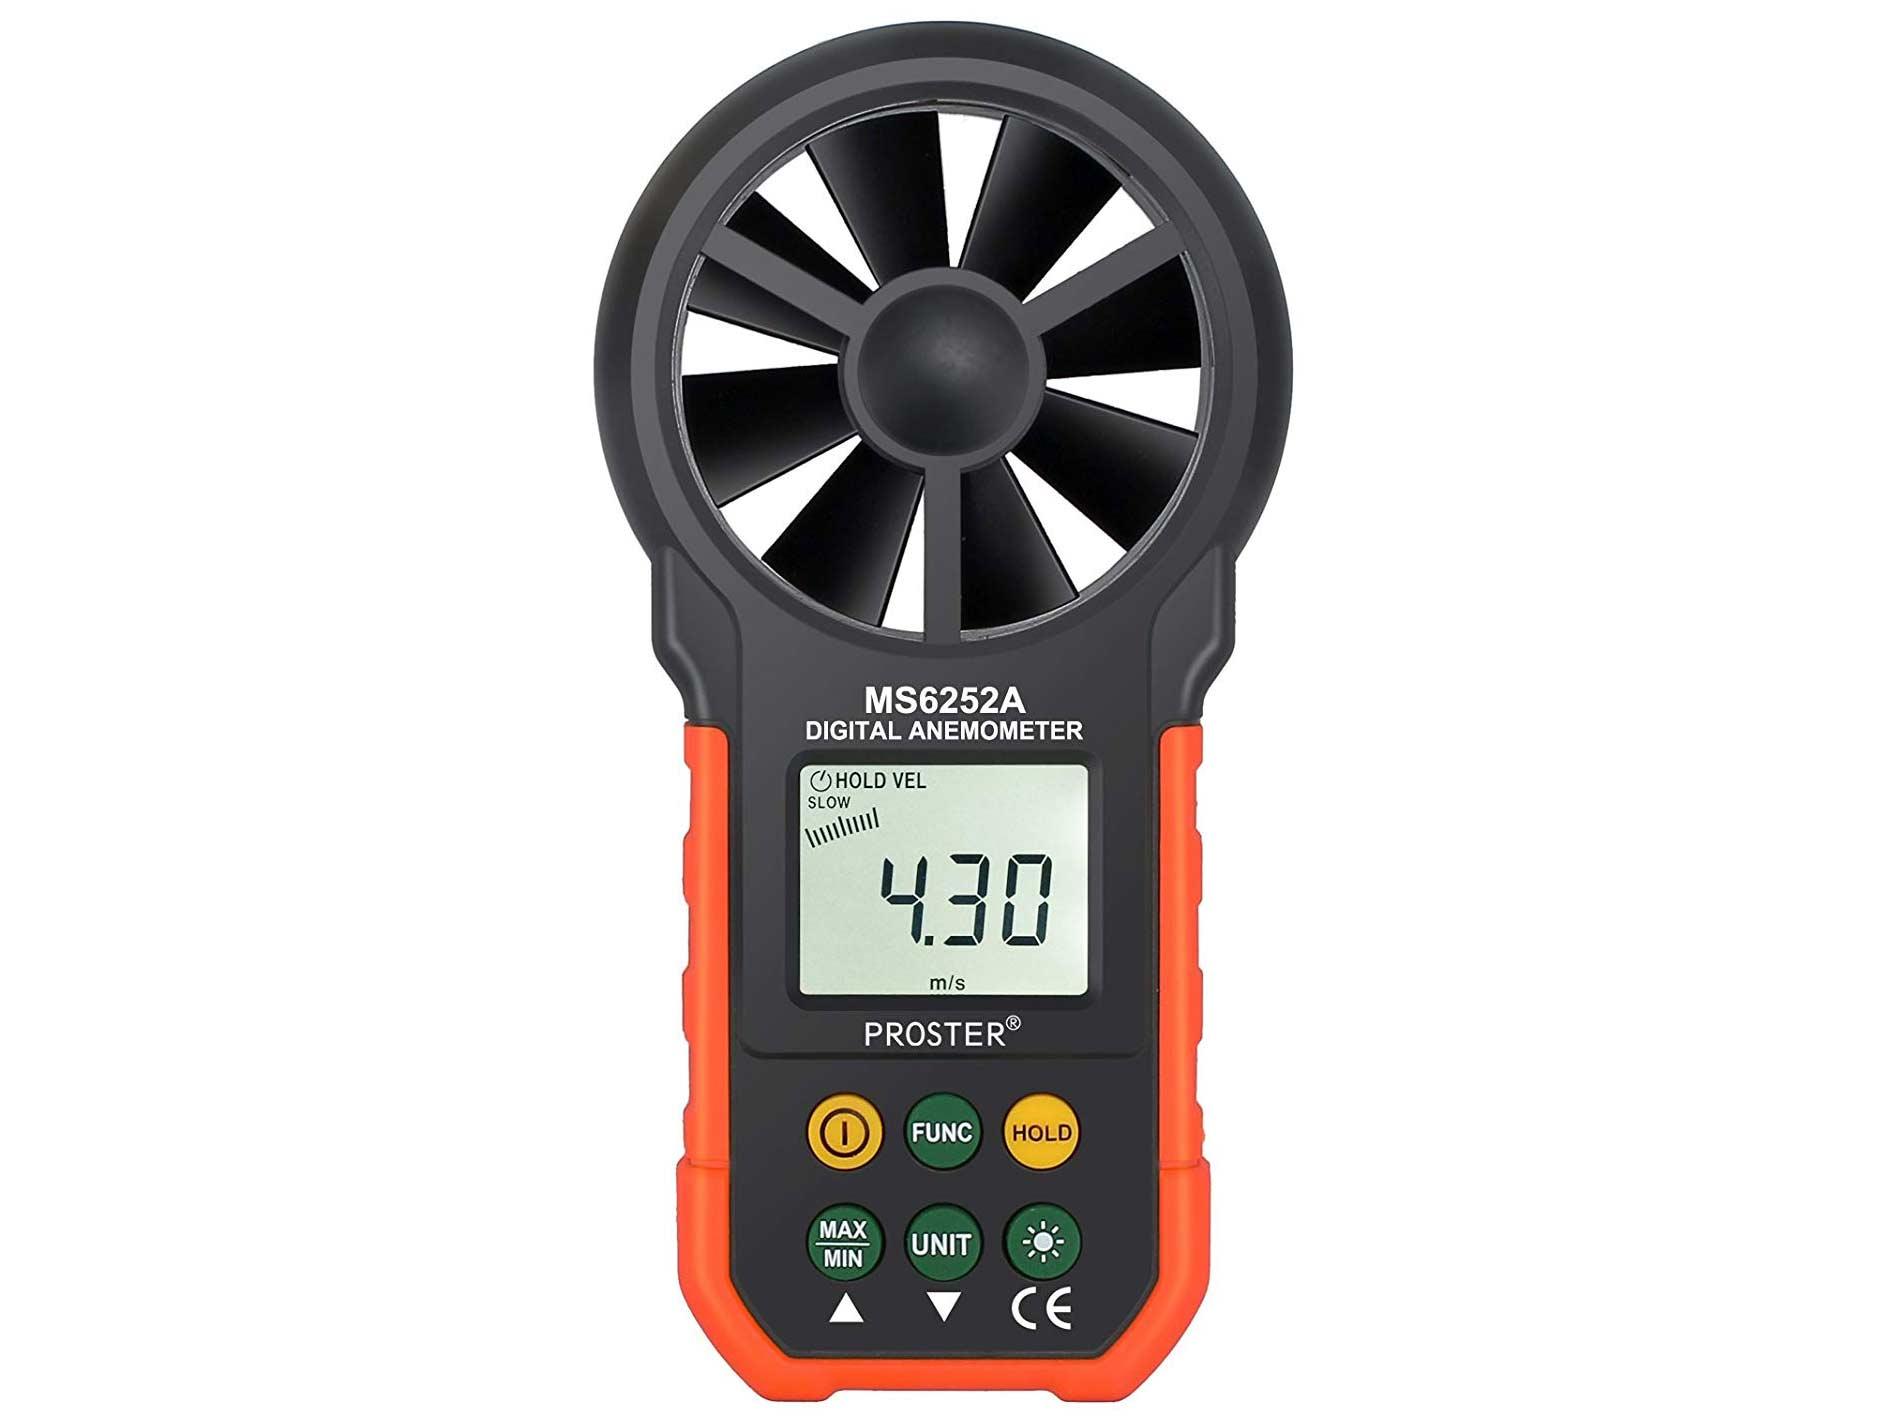 Proster Handheld Anemometer Portable Wind Speed Meter